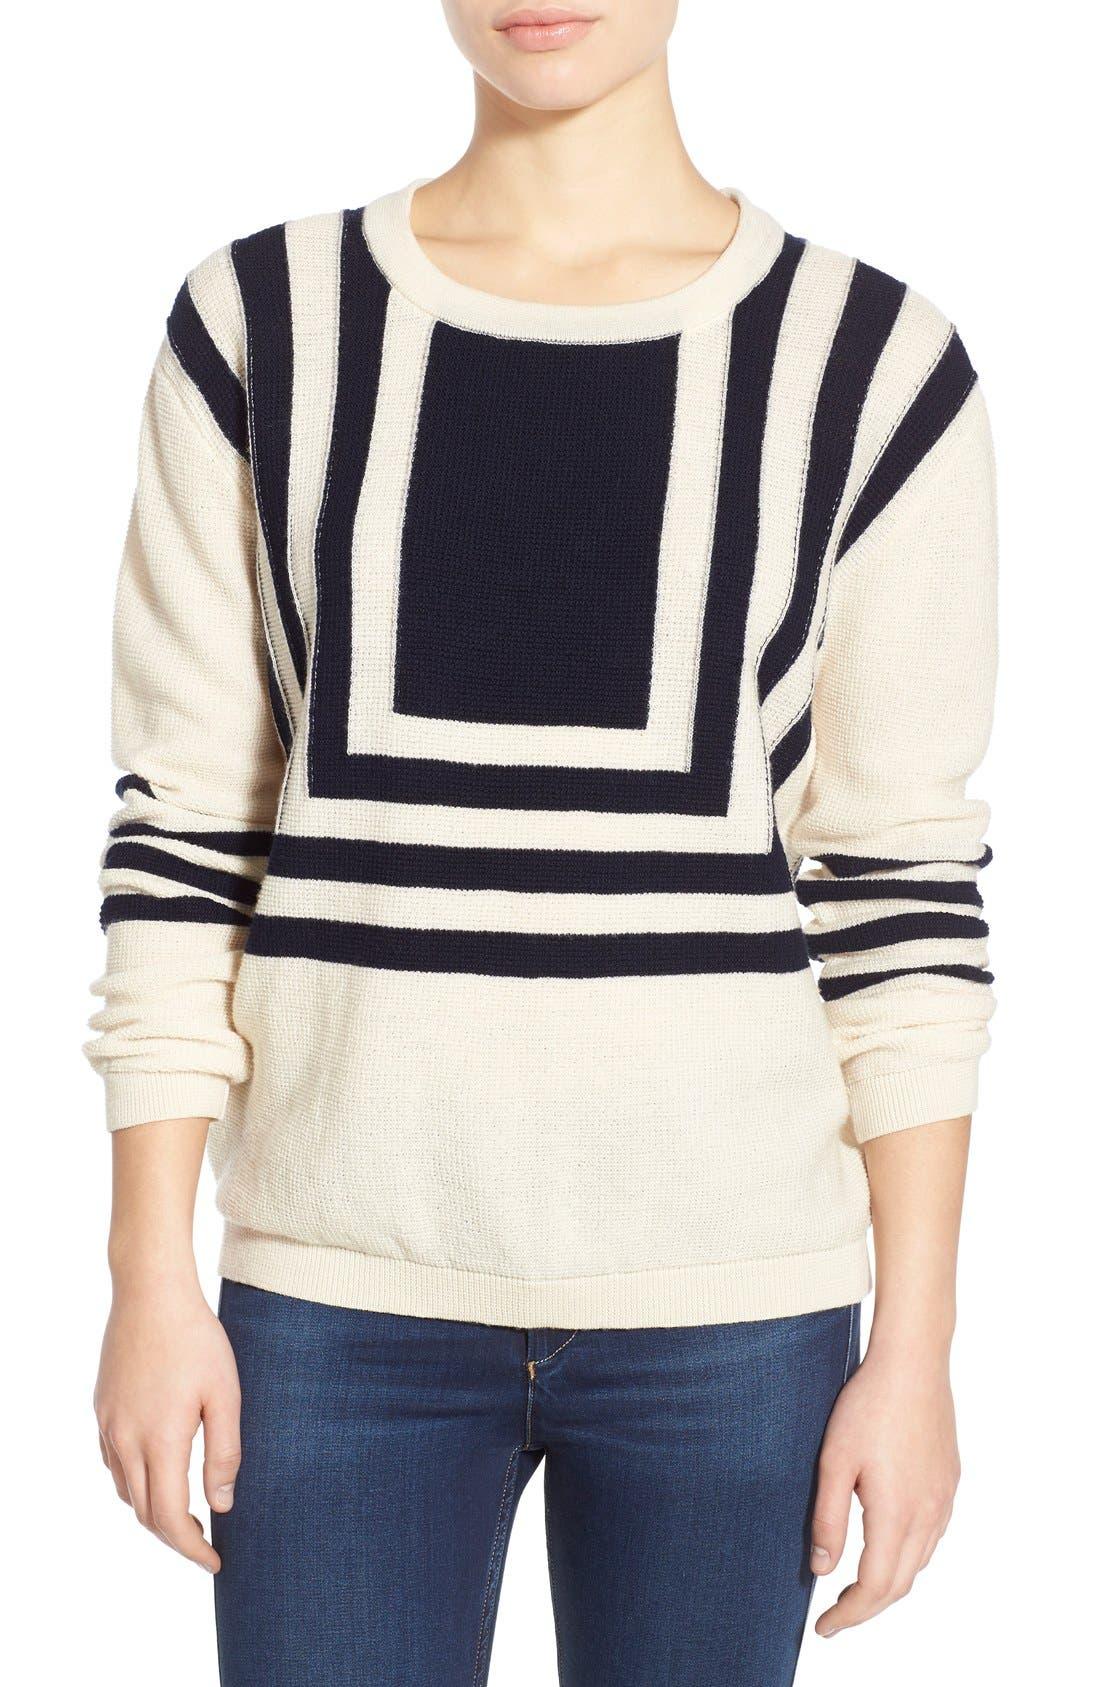 Alternate Image 1 Selected - M.i.h. Jeans 'Bib Breton' Crewneck Sweater